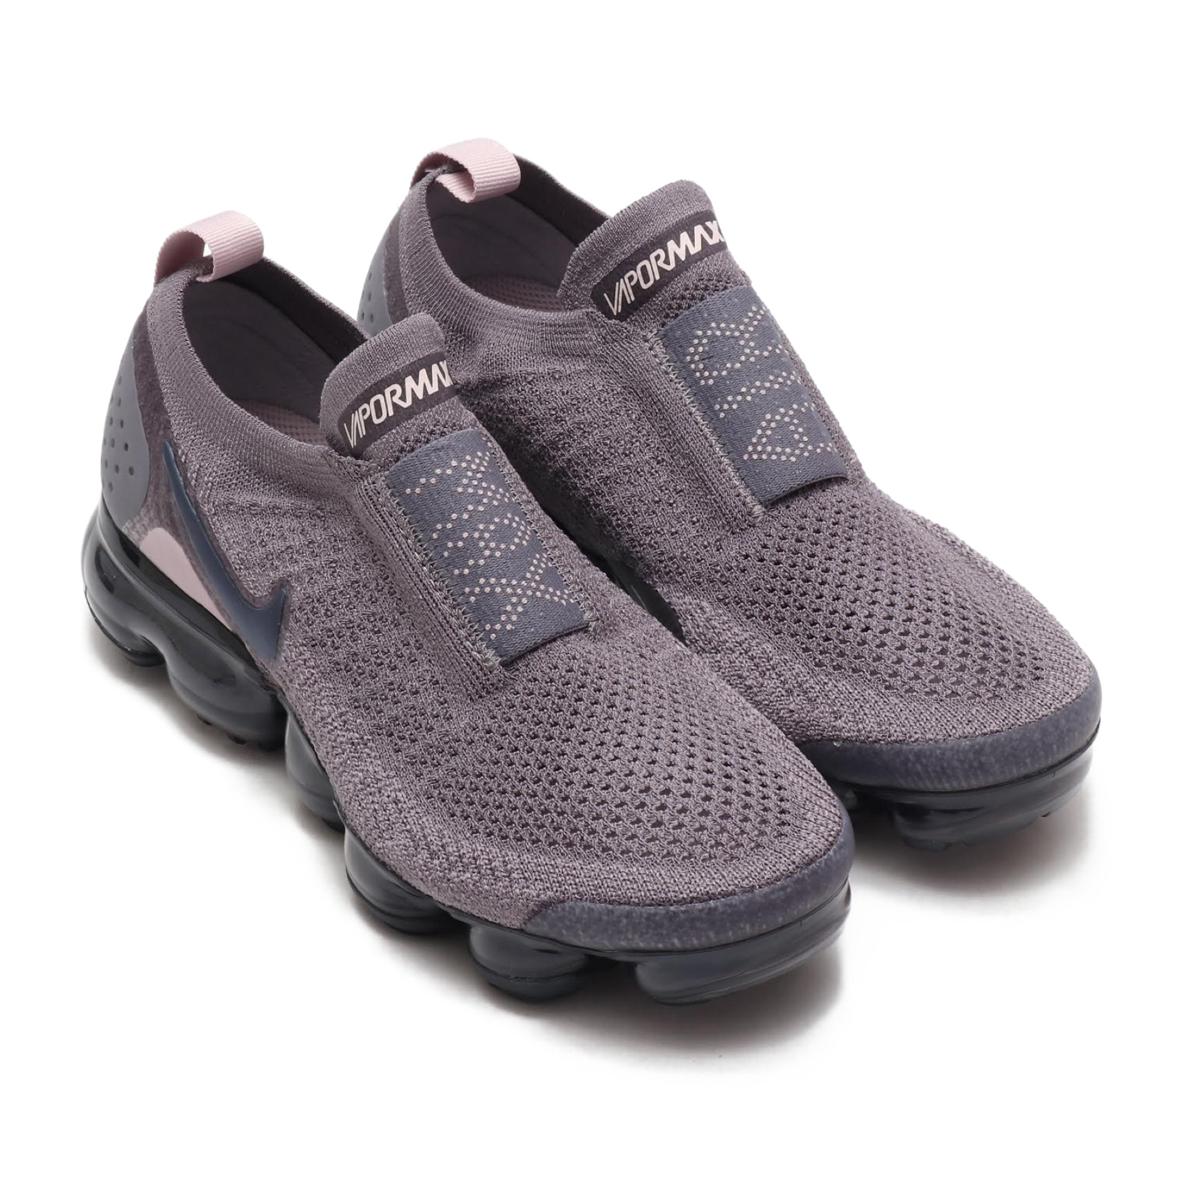 size 40 8d227 22f30 NIKE WMNS AIR VAPORMAX FK MOC 2 (Nike women air vapor max fried food knit  mock 2) GUNSMOKE/BLACKENED BLUE-THUNDER GREY 18FA-I